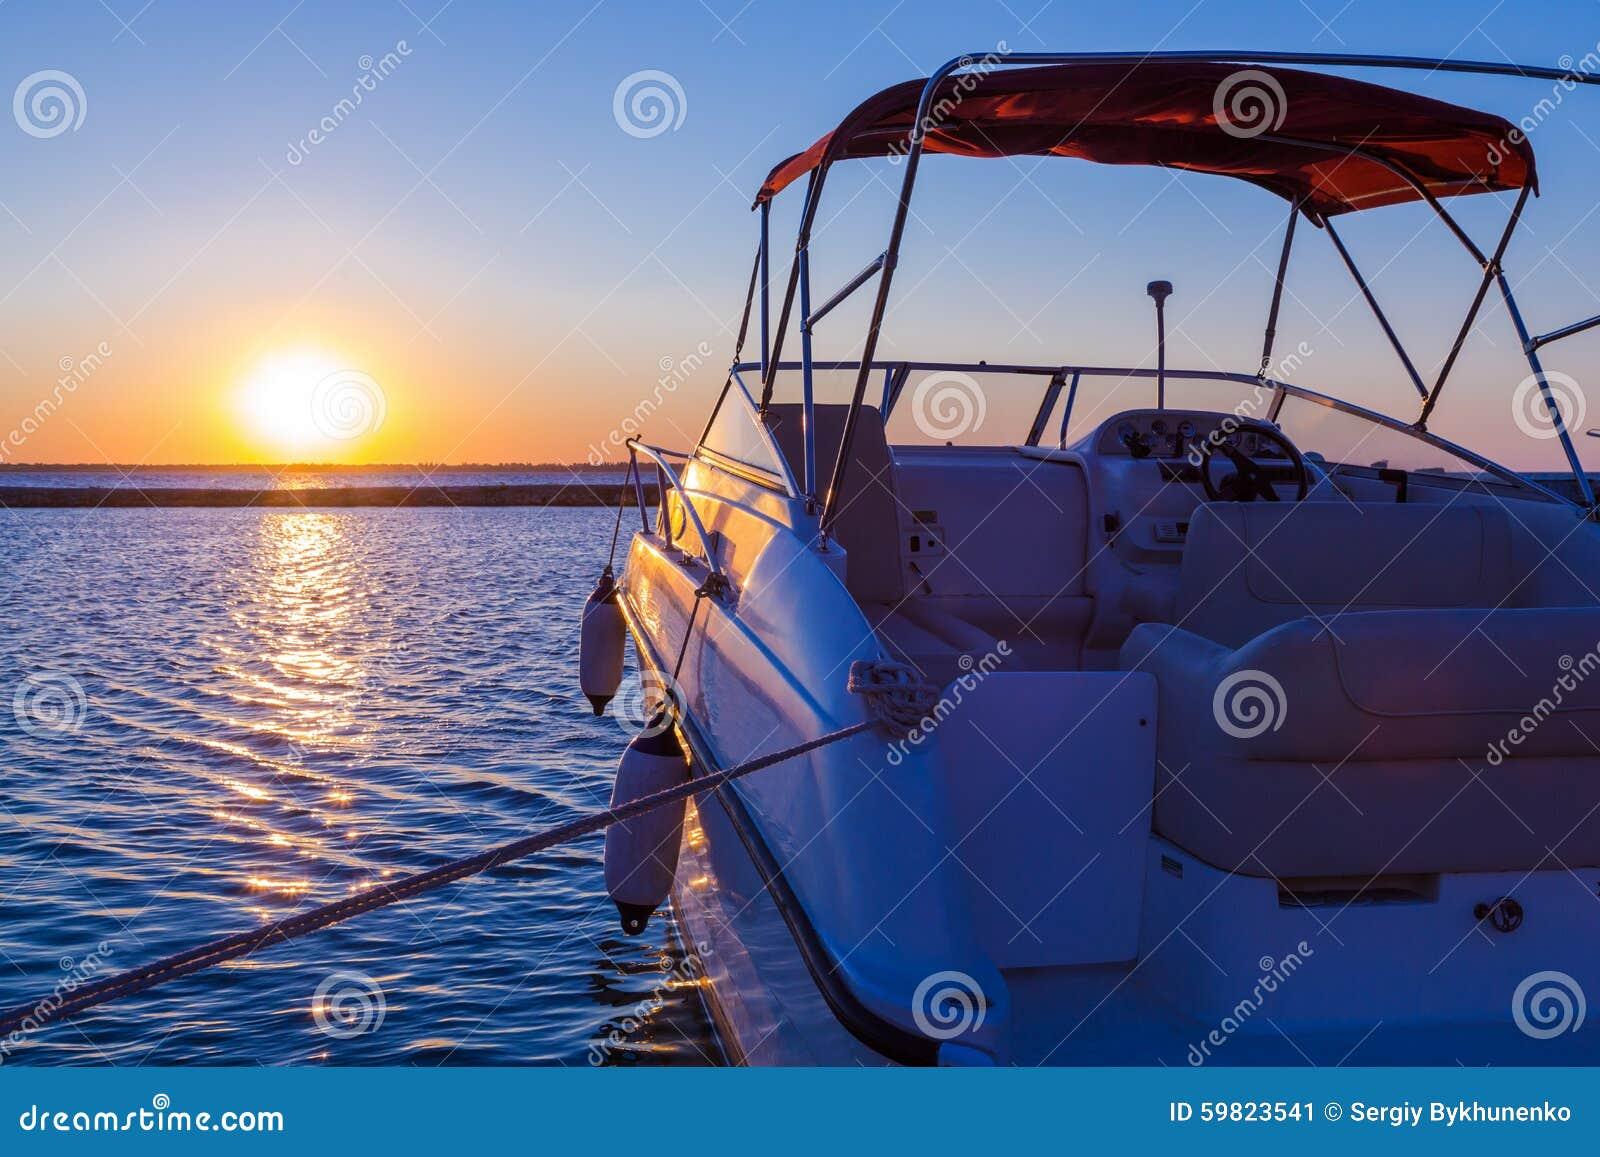 Яхта около пристани против захода солнца